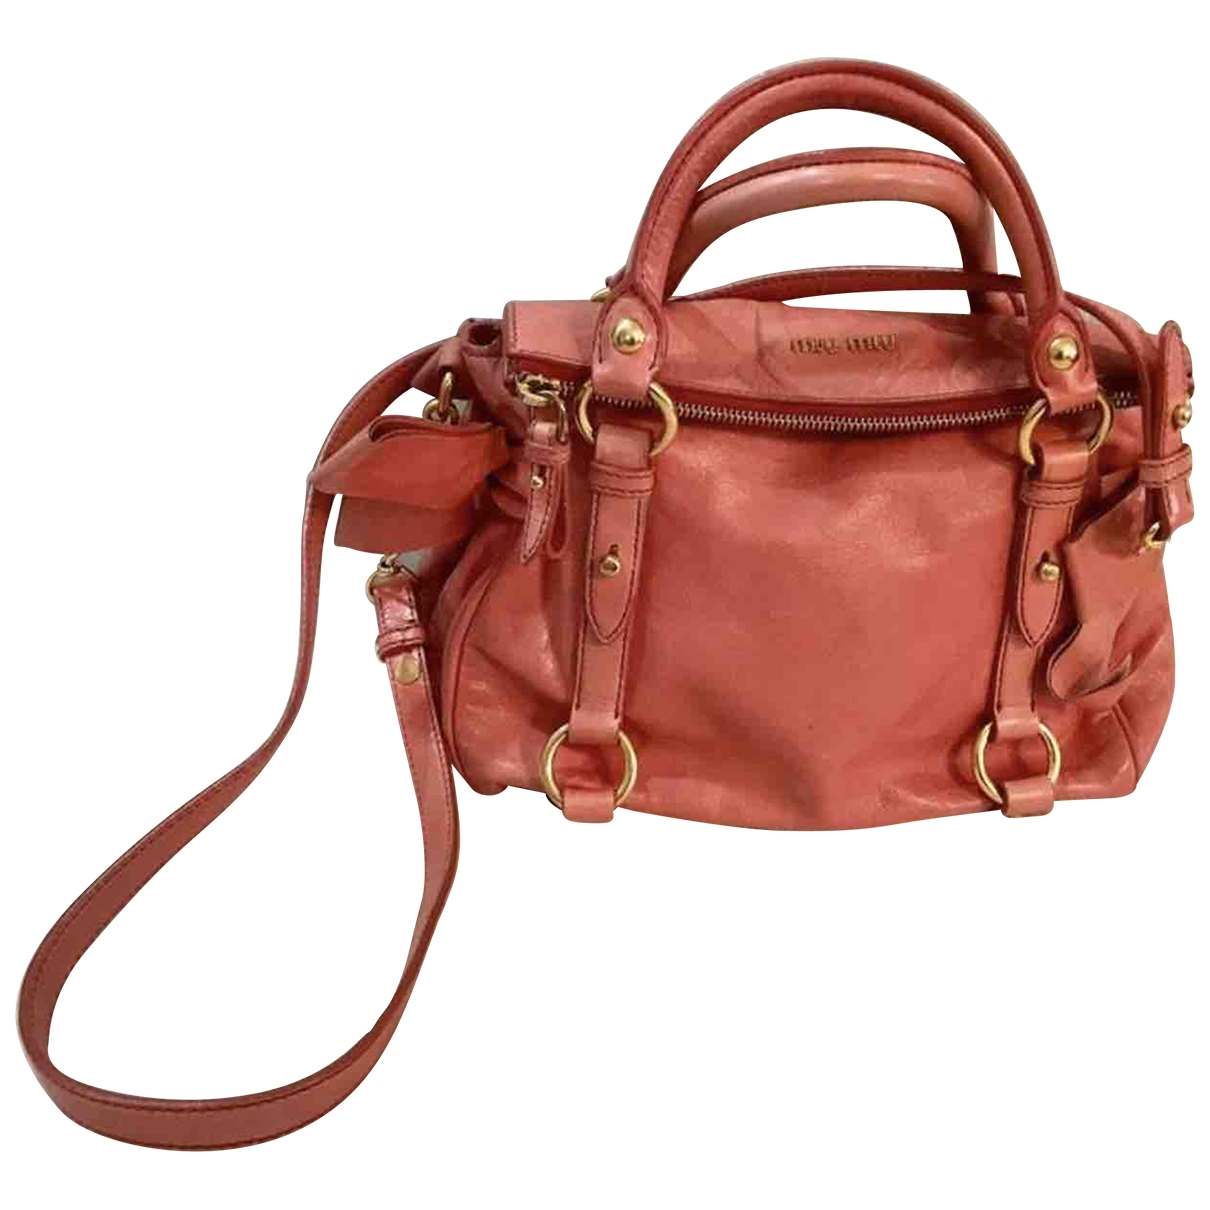 Miu Miu - Sac a main Bow bag pour femme en cuir - rose